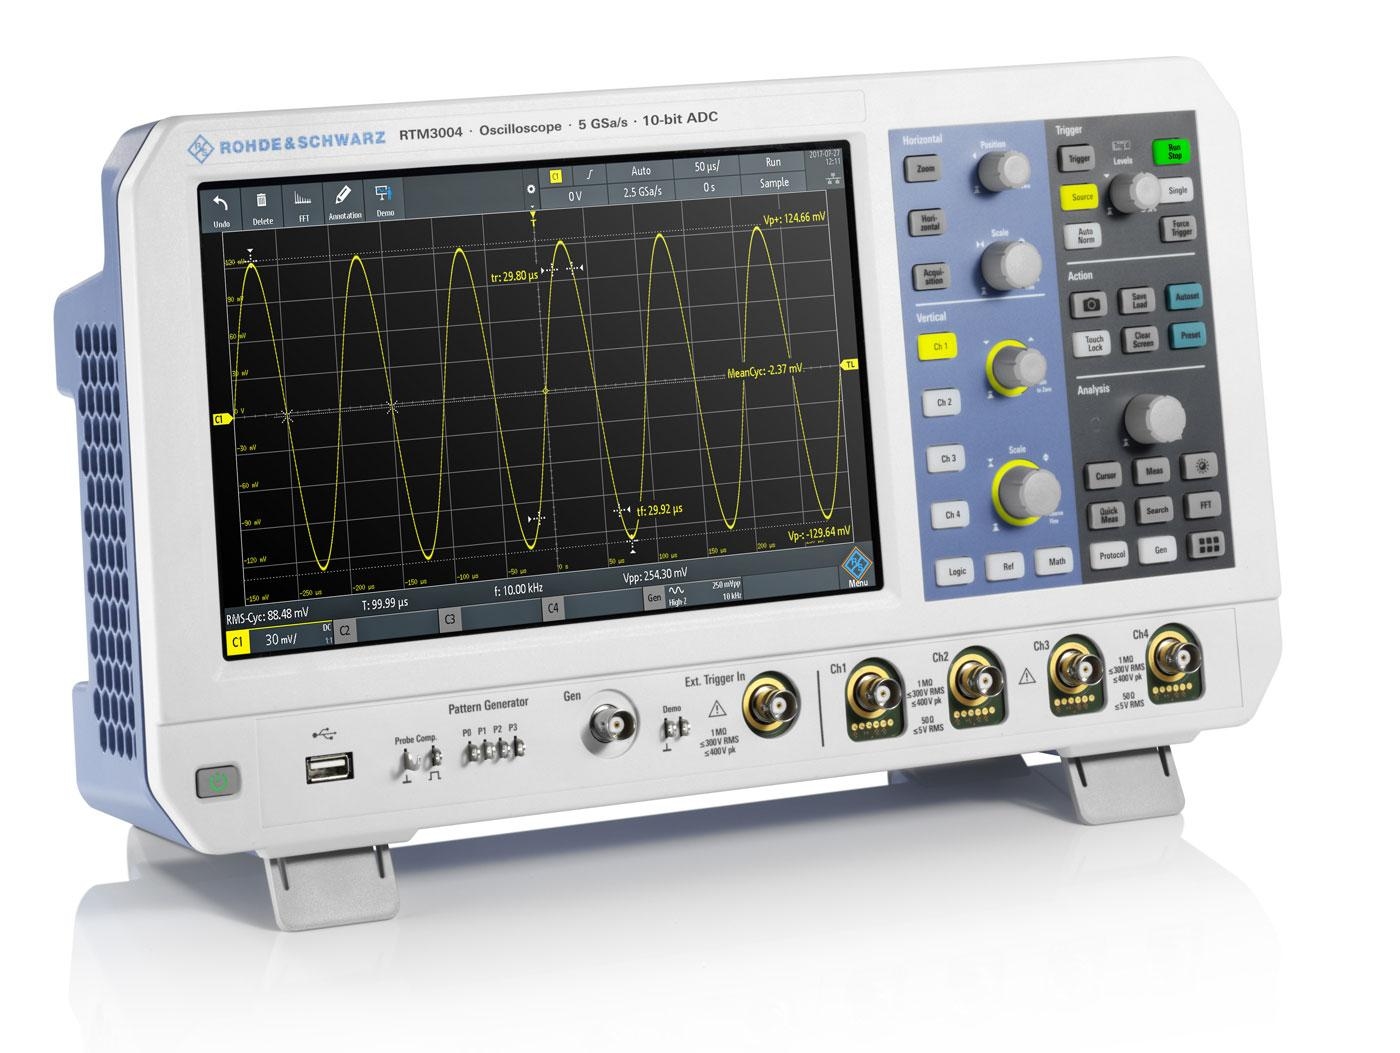 Rohde & Schwarz RTM3004 5GSa/s Oszilloskop